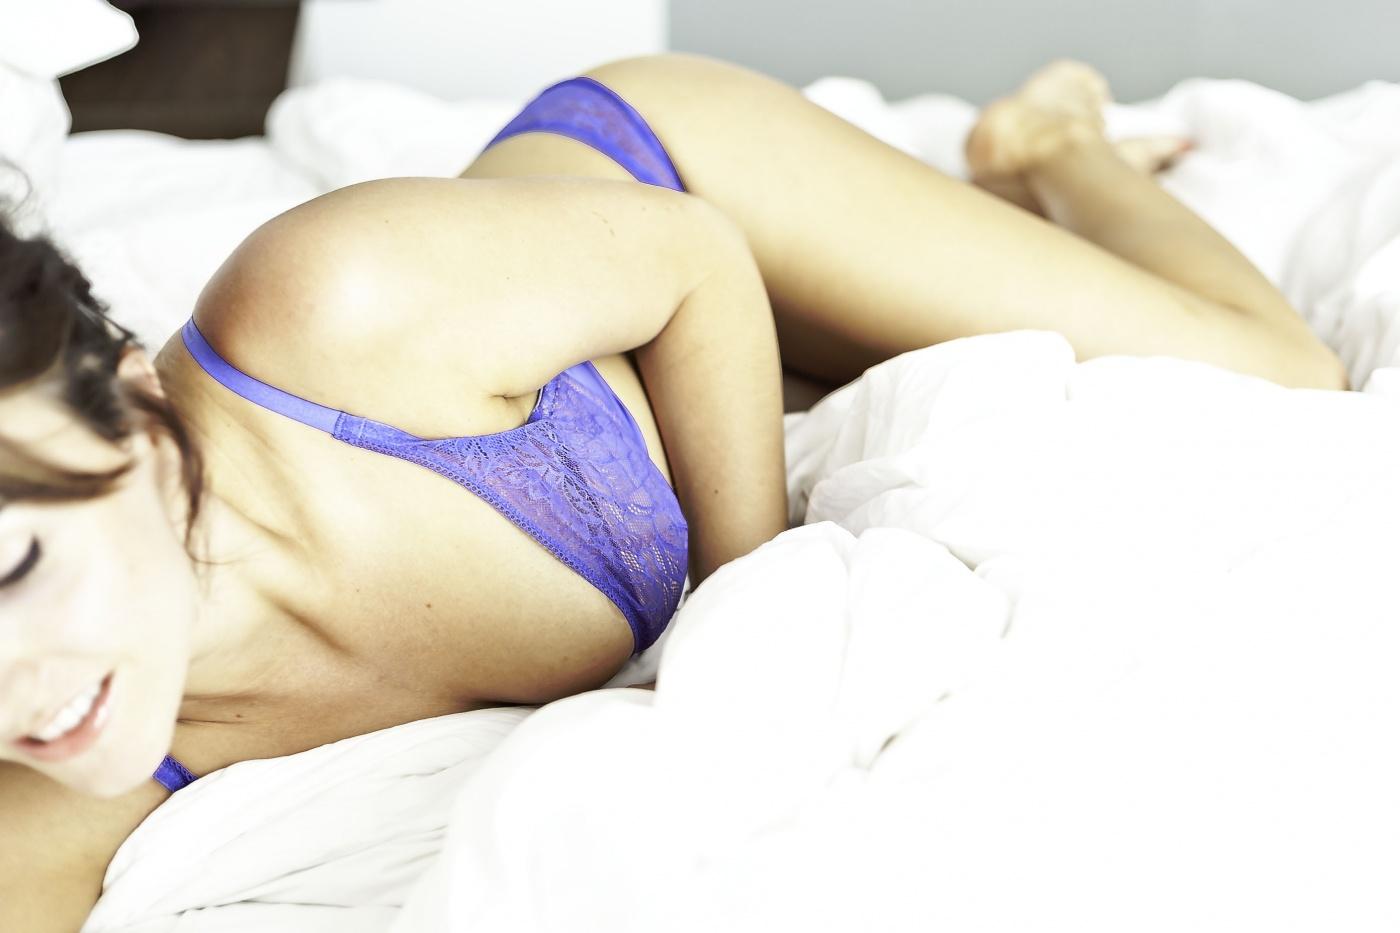 Ava Hudson